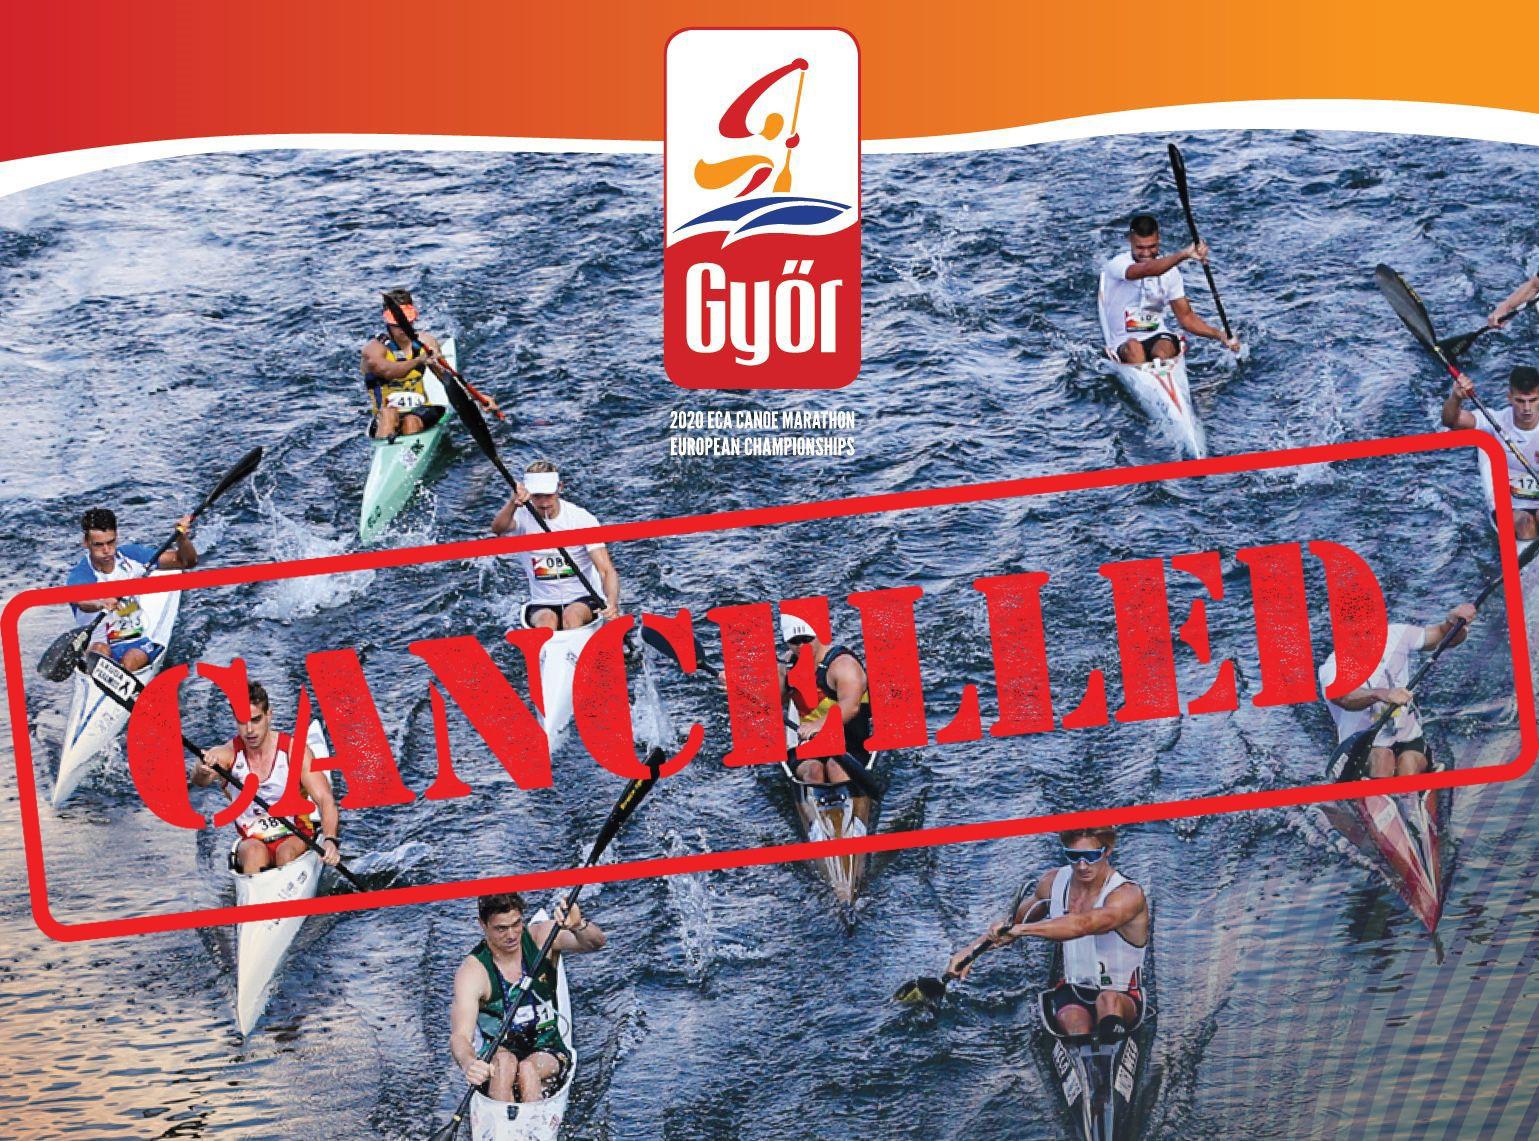 Canoe Marathon European Championships cancelled due to coronavirus